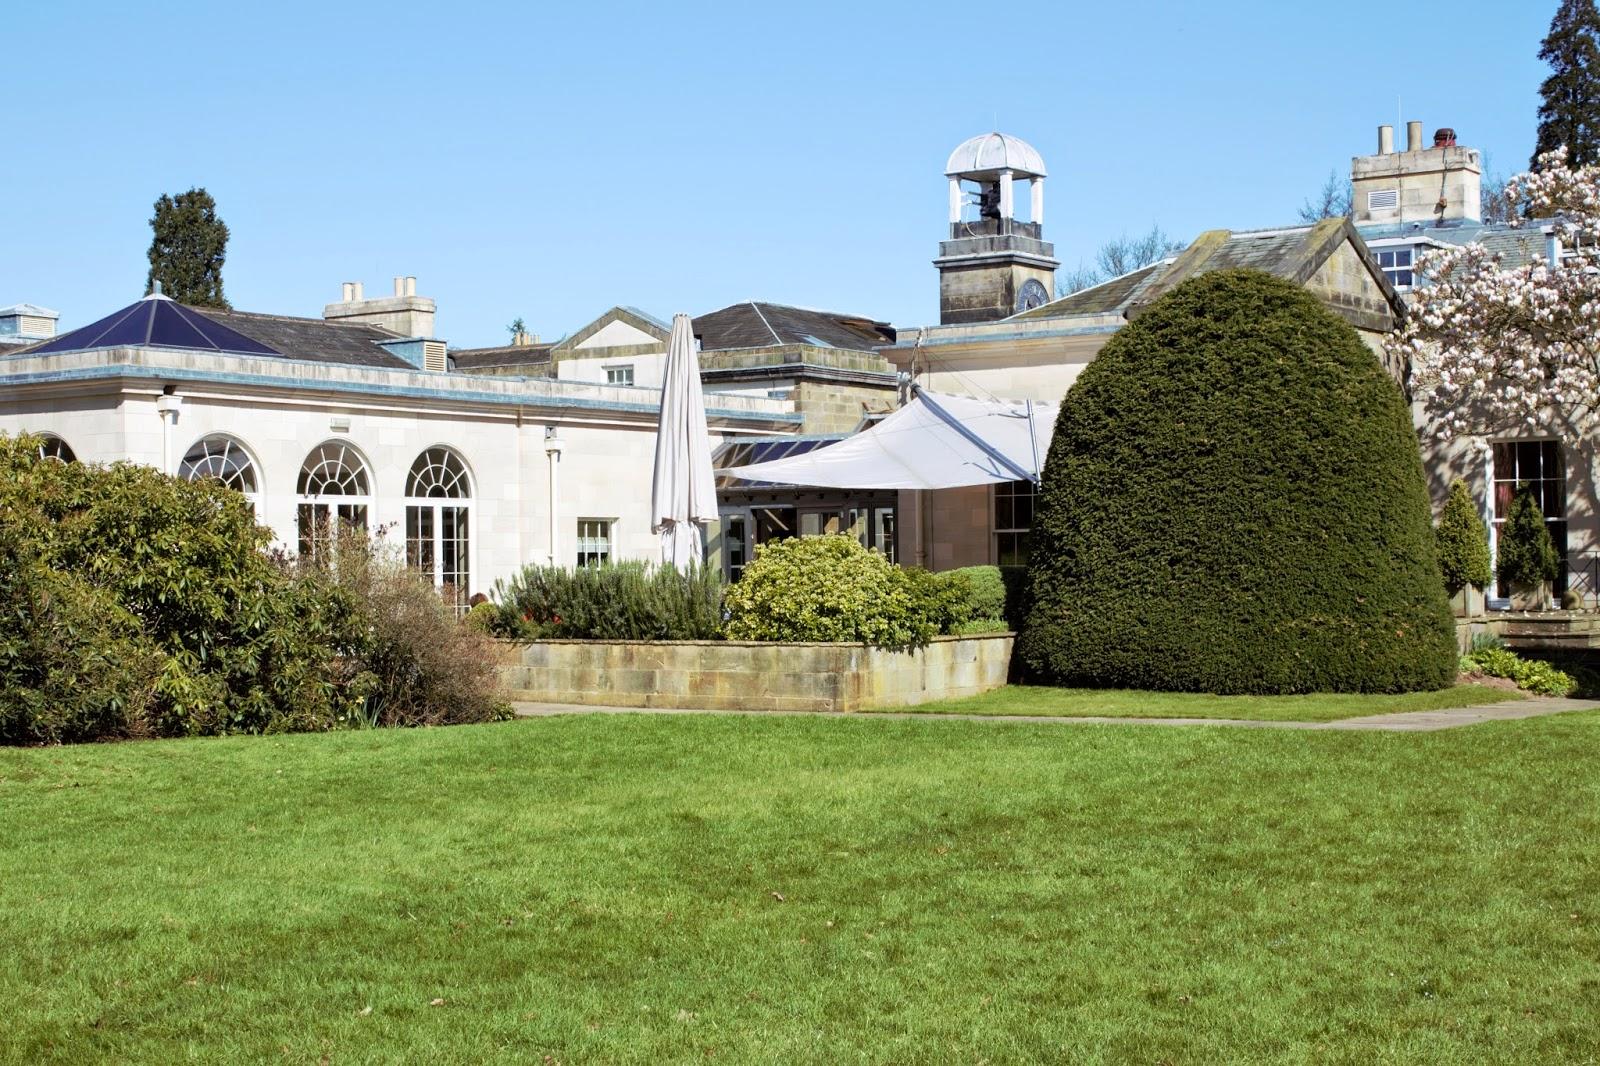 Exterior, Rudding Park Hotel, Harrogate